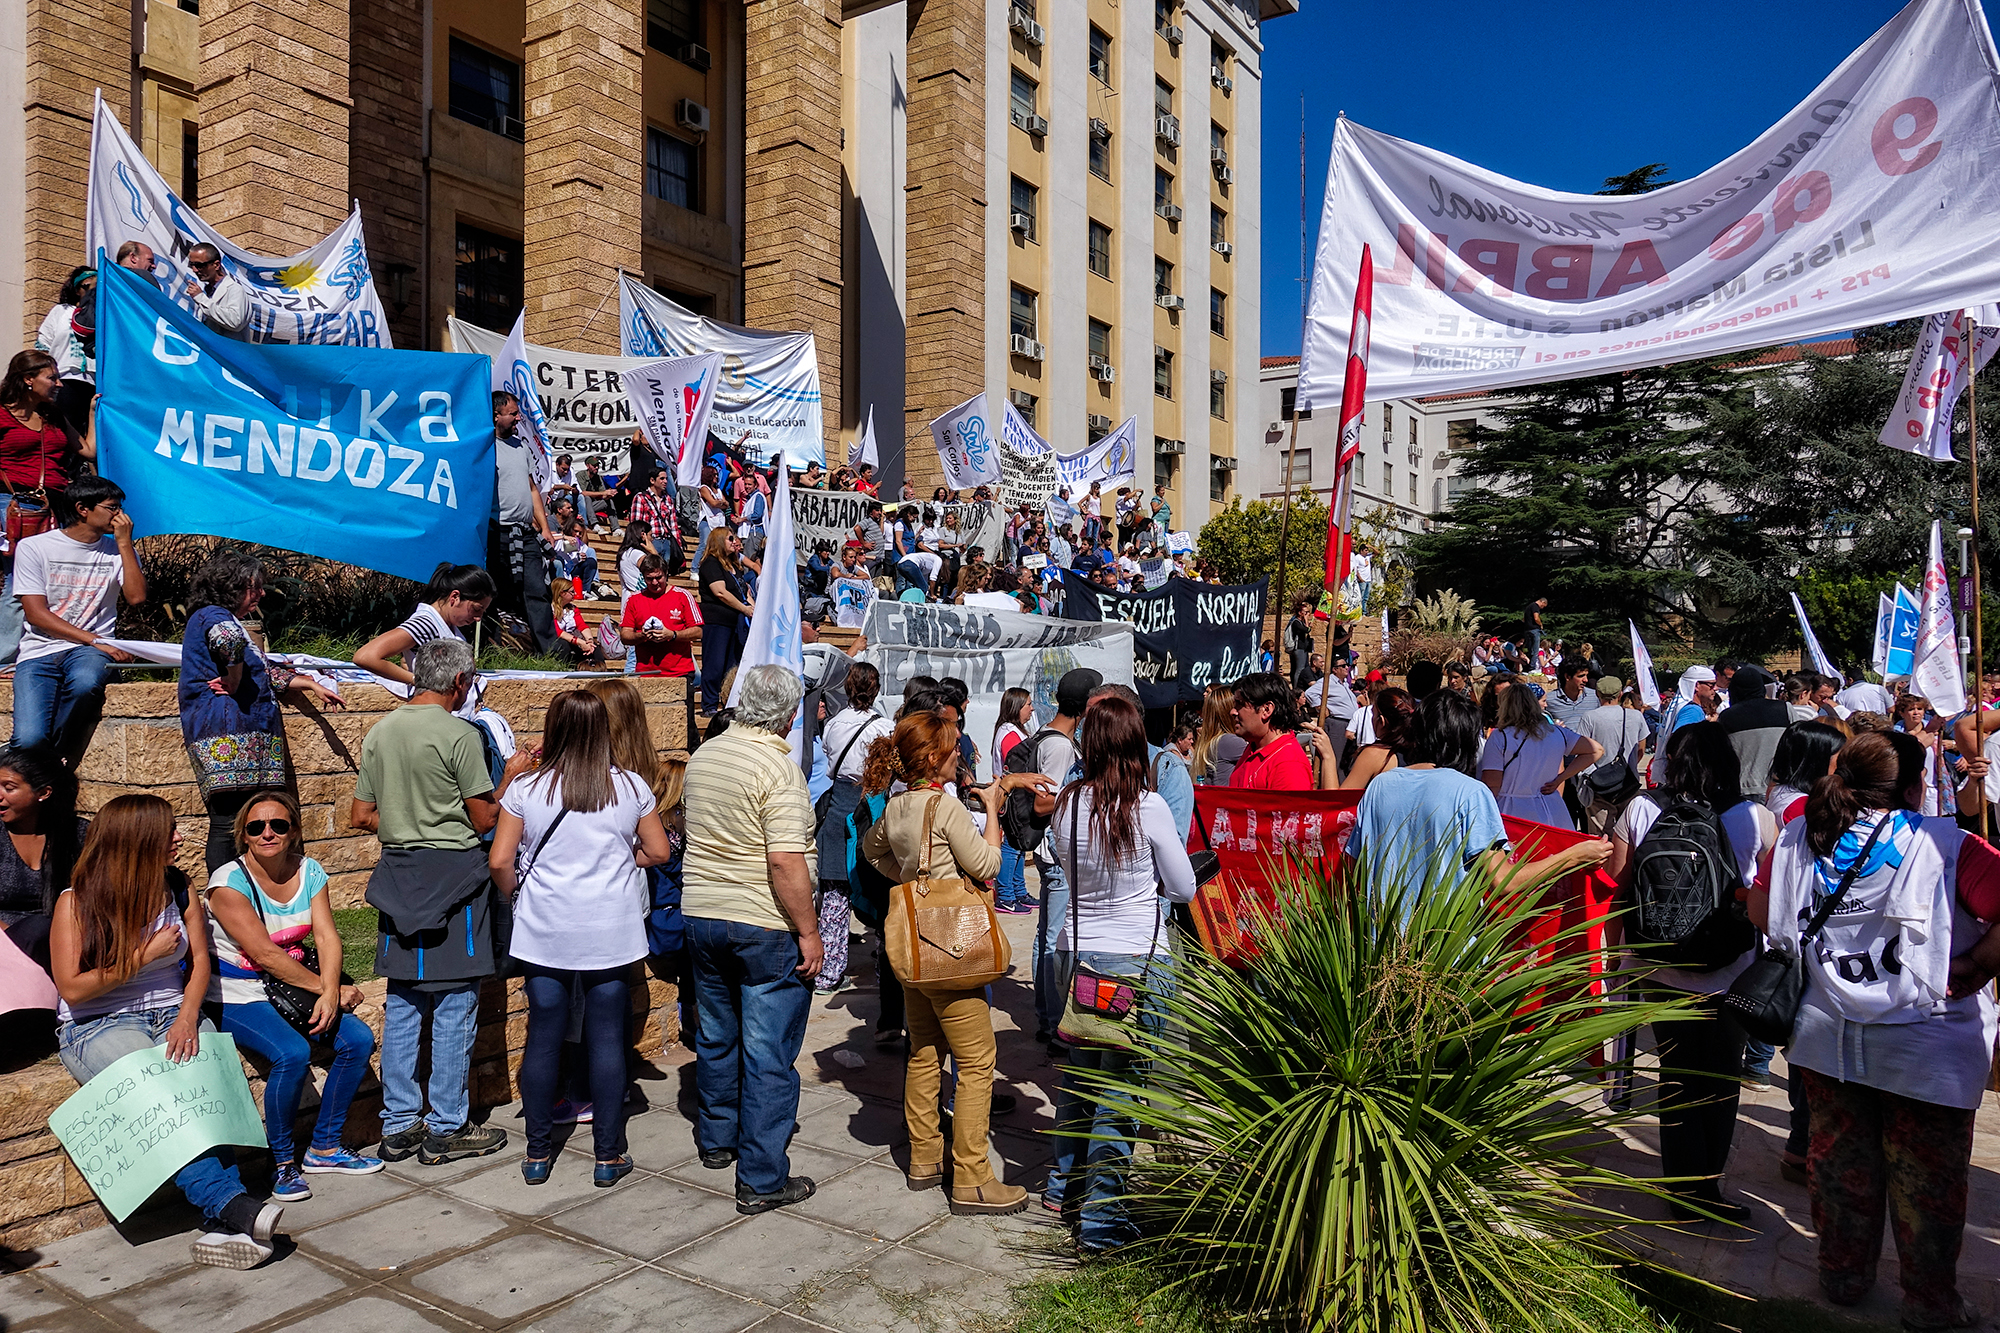 Paro, #3. March 21, 2016, Mendoza Argentina